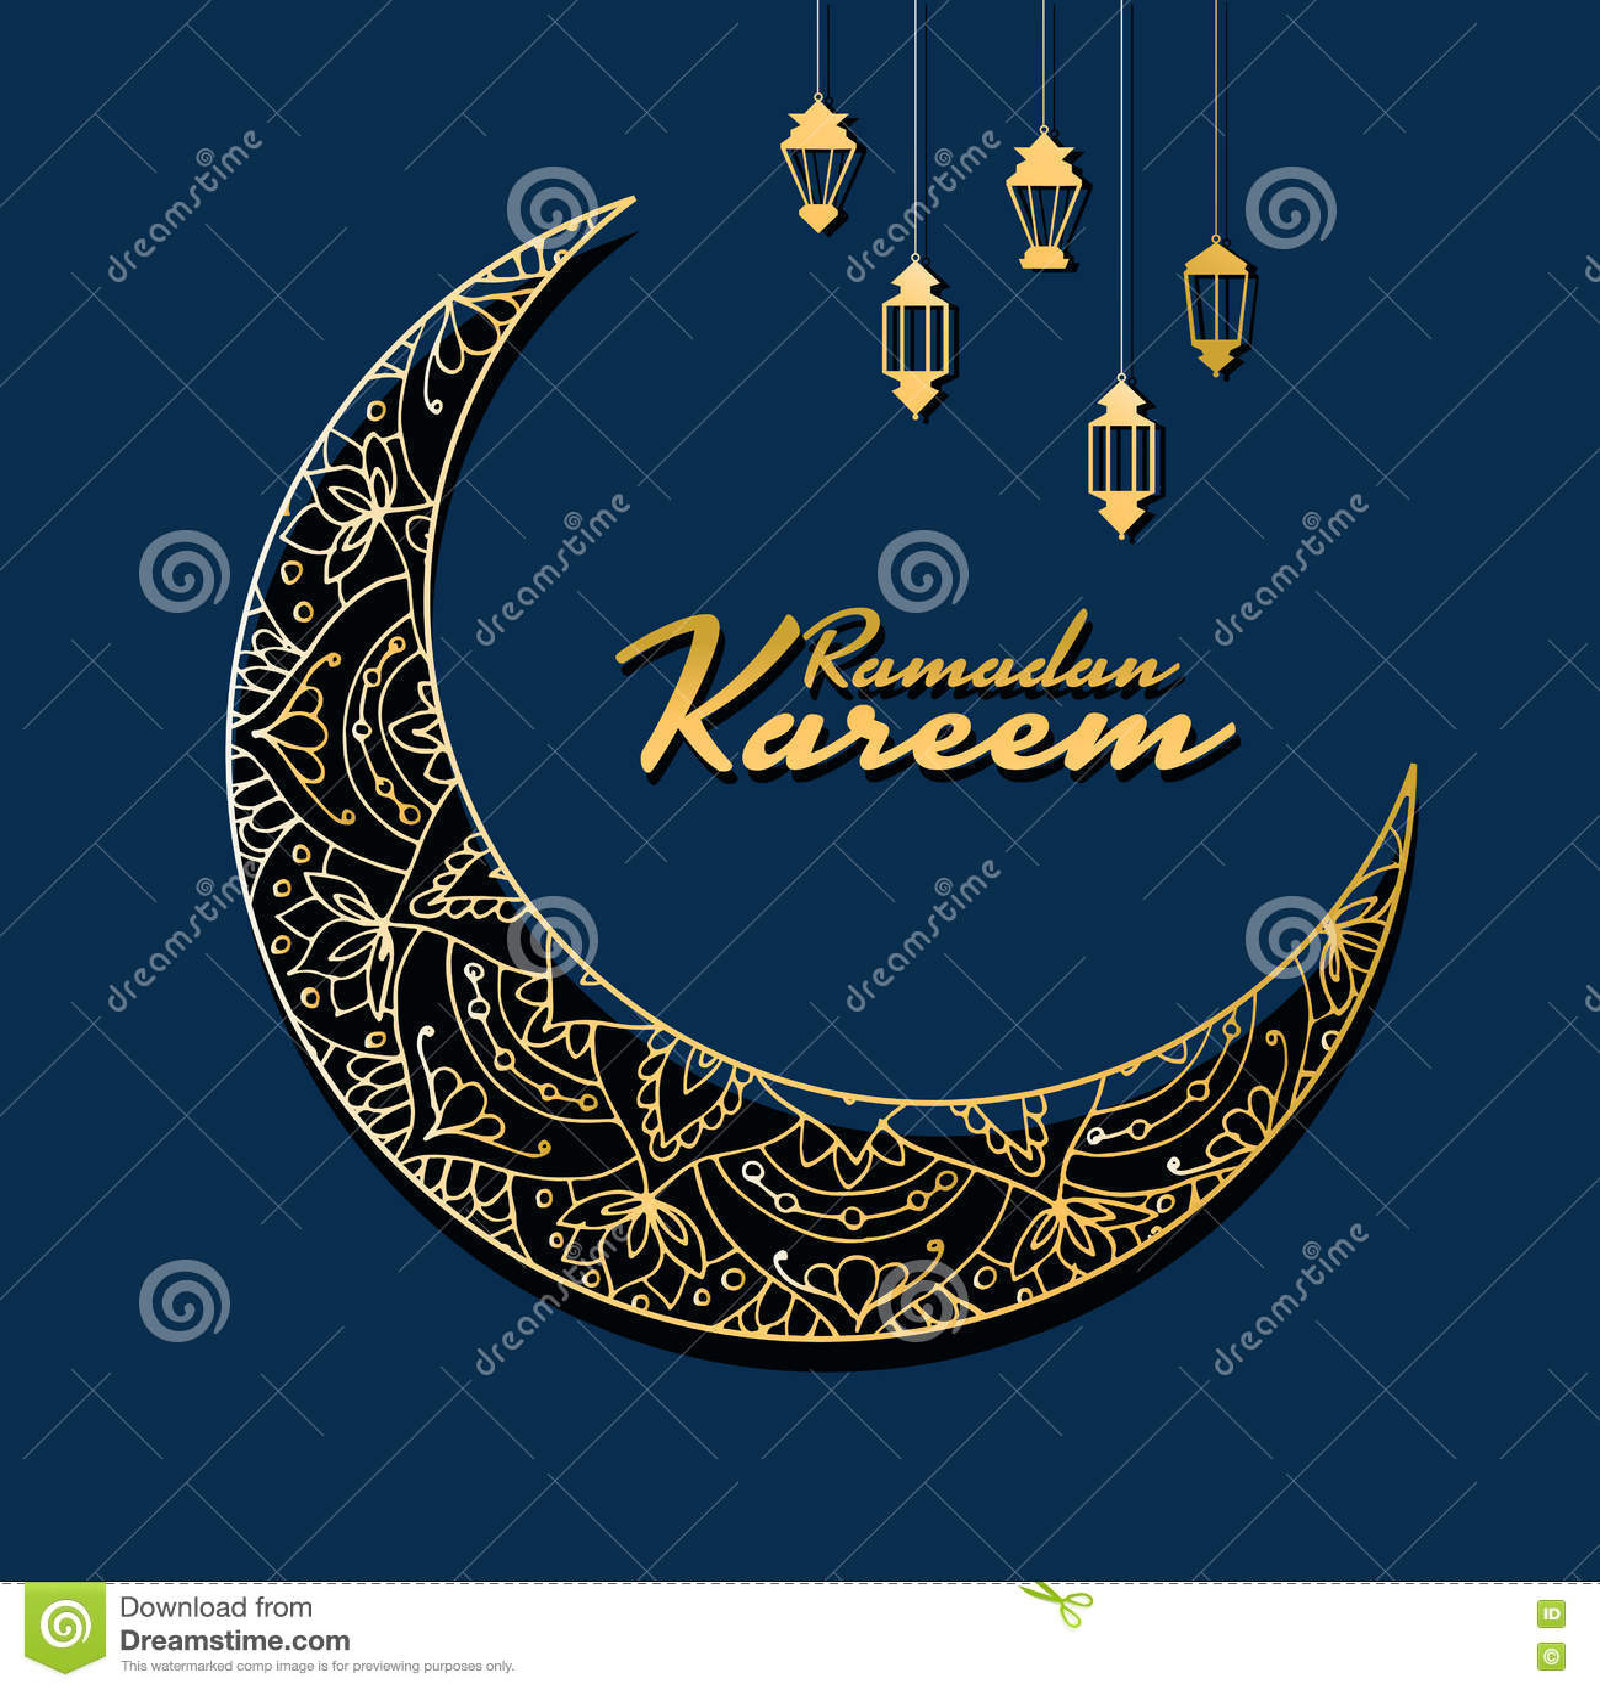 Traditional ramadan kareem art month celebration greeting card traditional ramadan kareem art month celebration greeting card festival design vector vector illustration cartoondealer 92184210 m4hsunfo